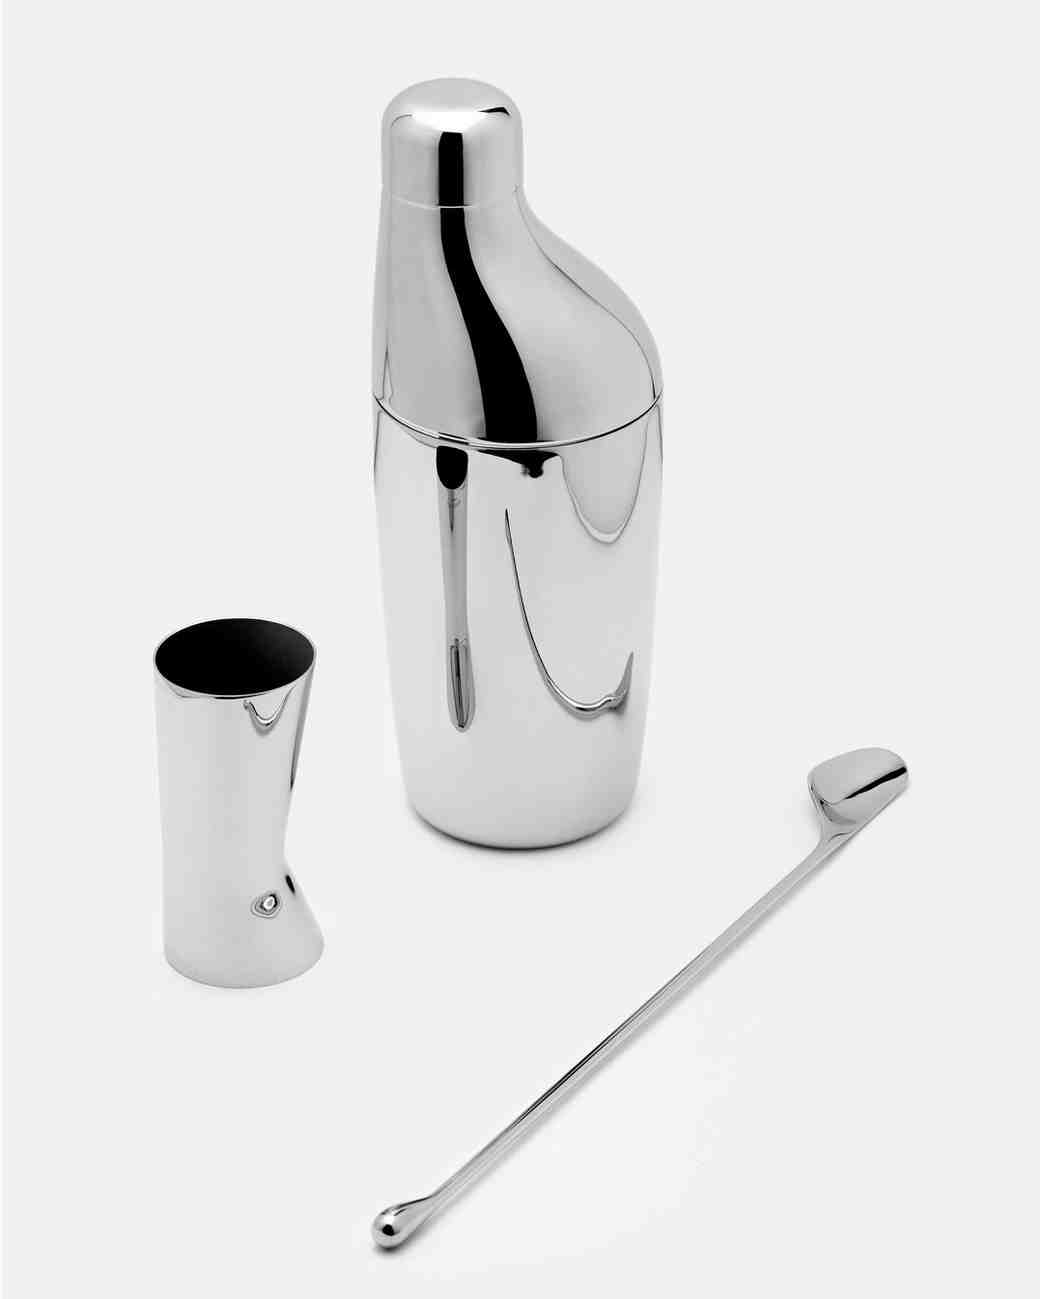 hollowware anniversary gifts sky cocktail shaker set georg jensen